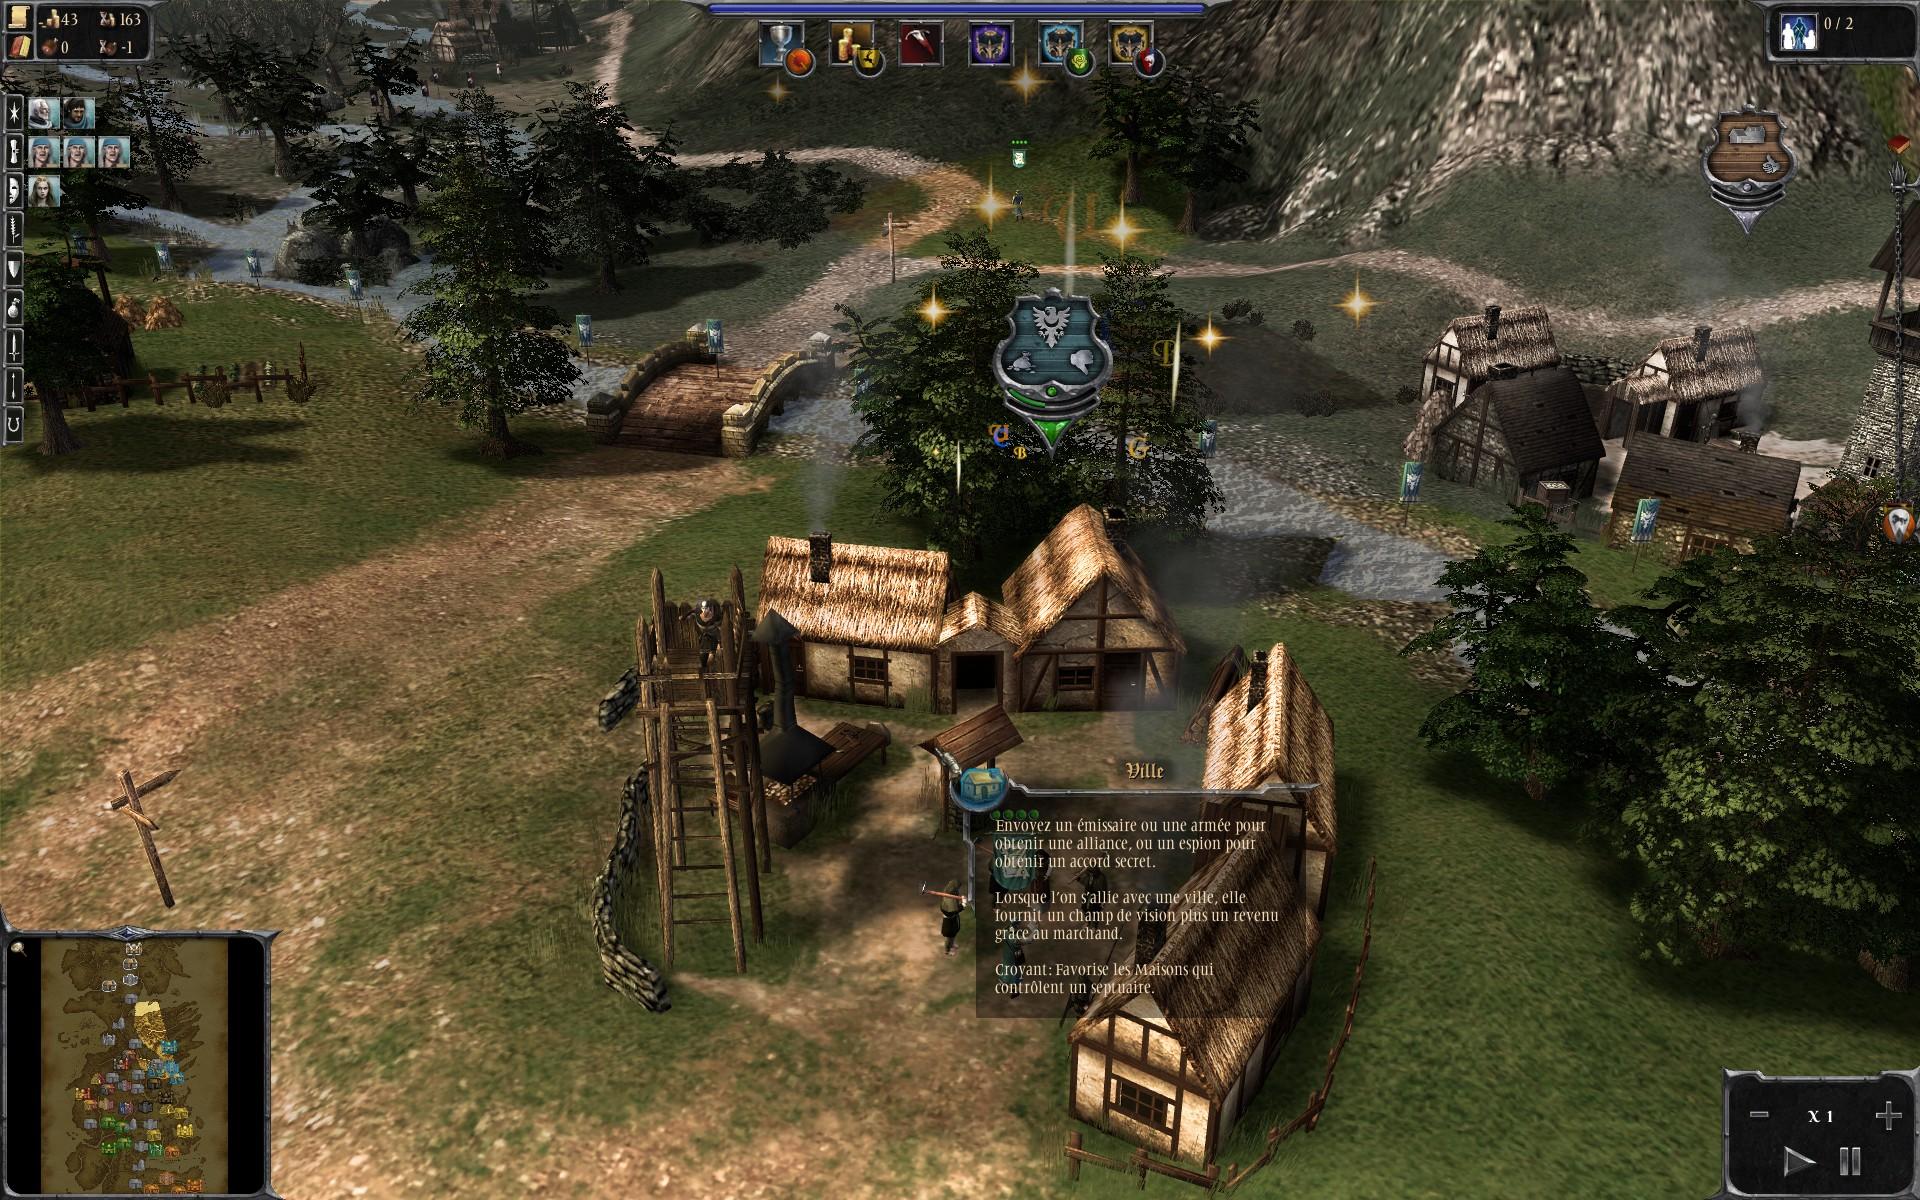 AGameofThrones-Genesis PC Test 011